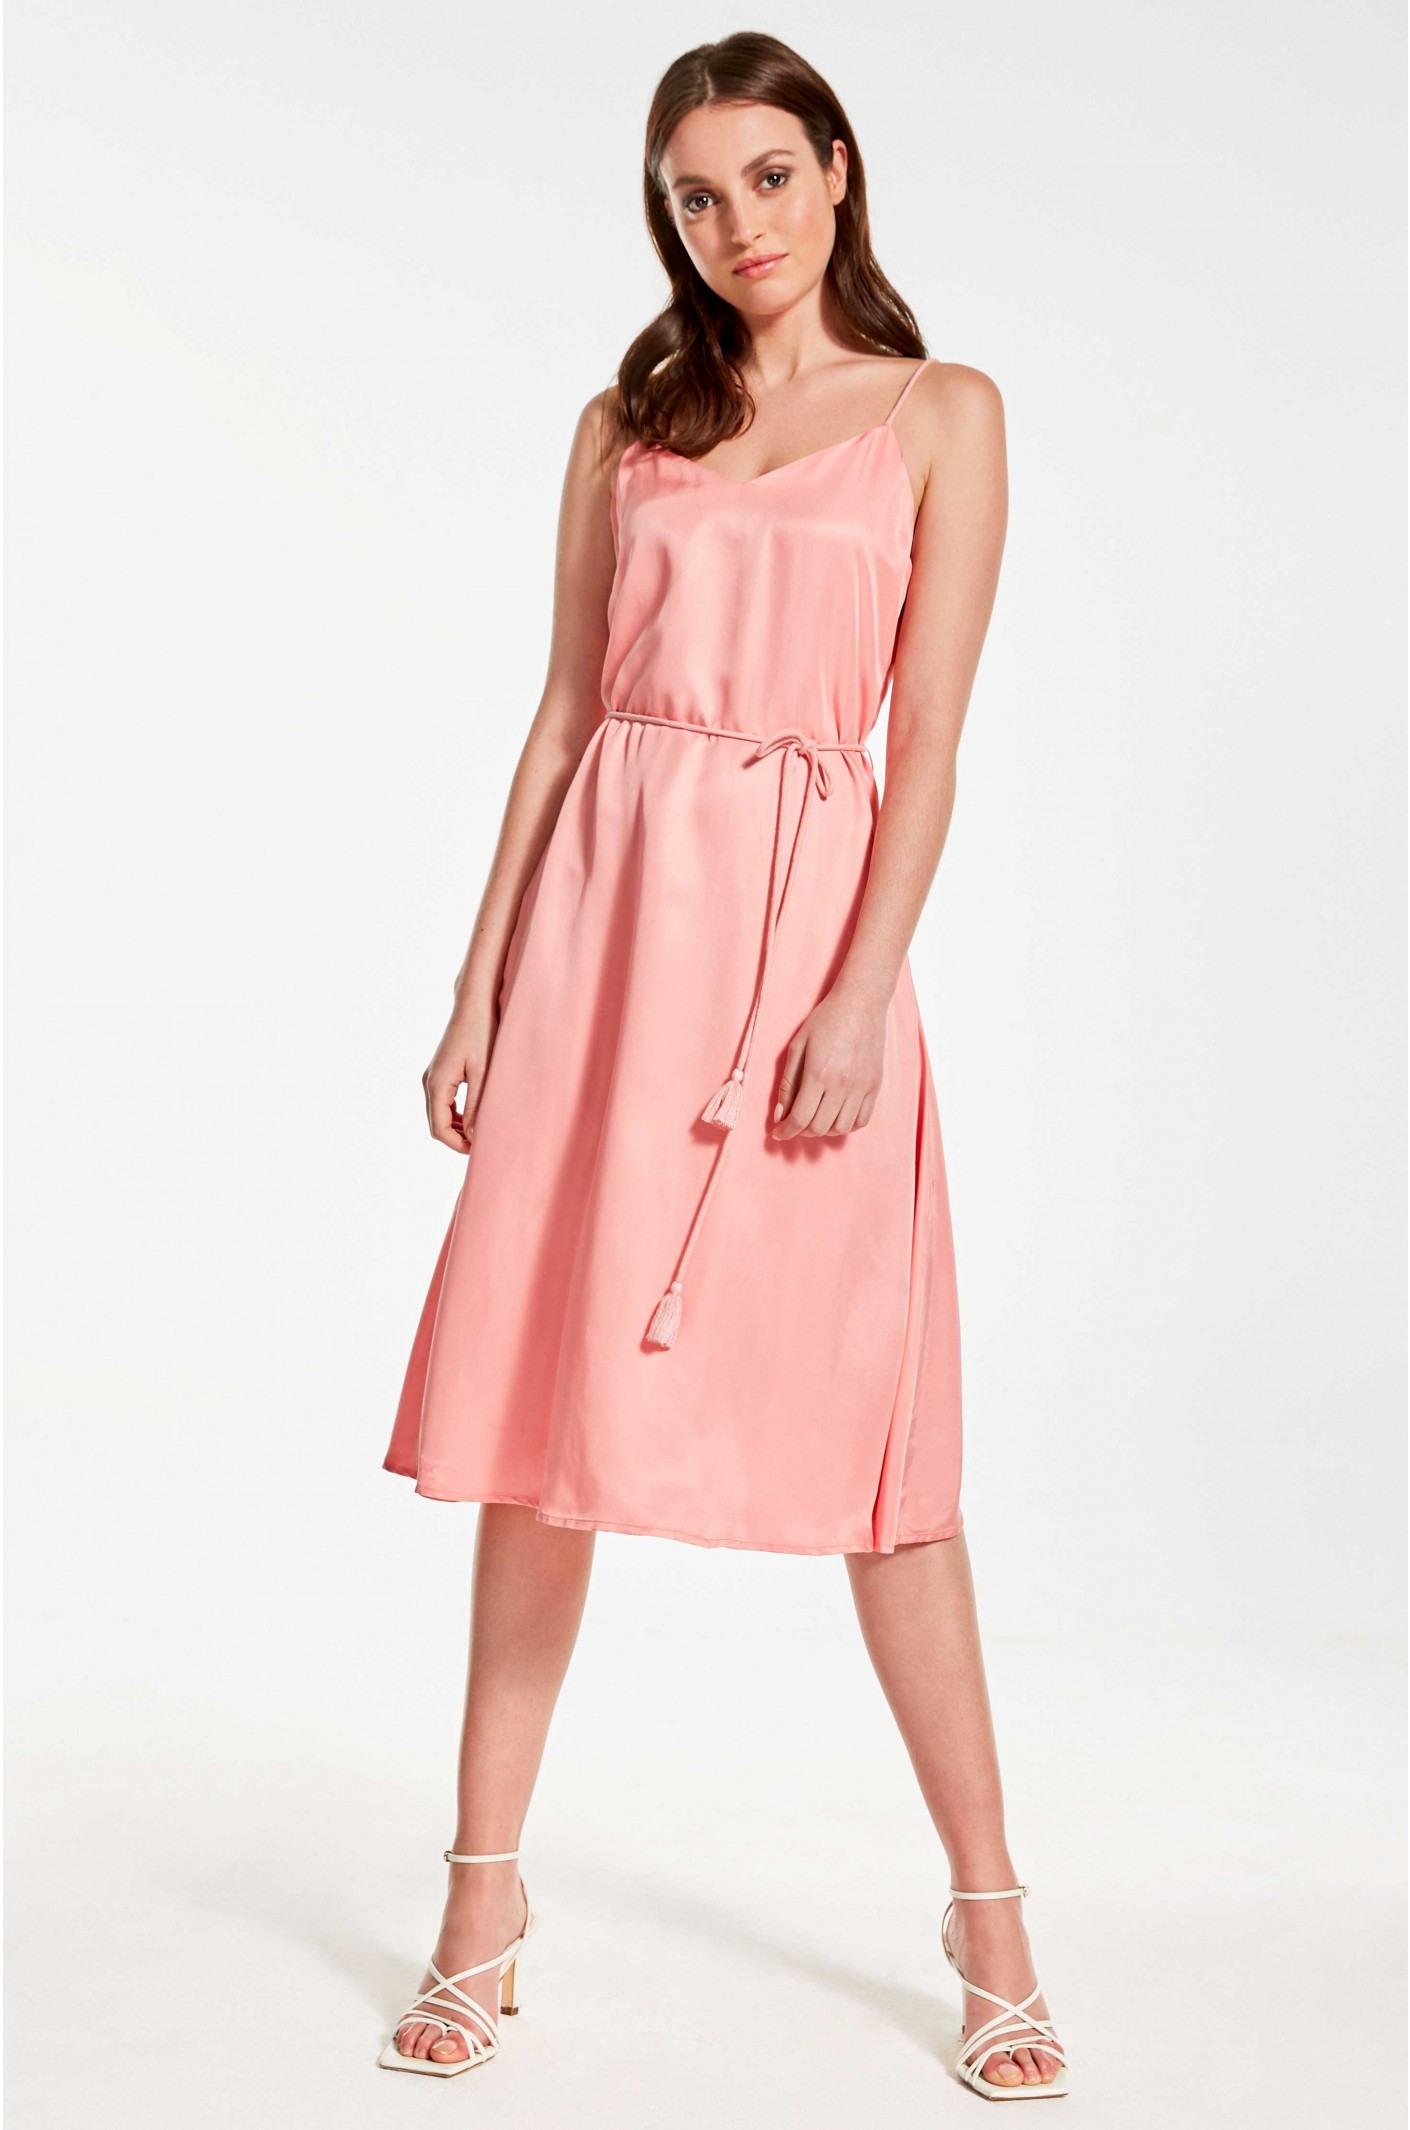 Kleid Mit Spaghettiträgern In Strahlendem Rosé  Kala Fashion